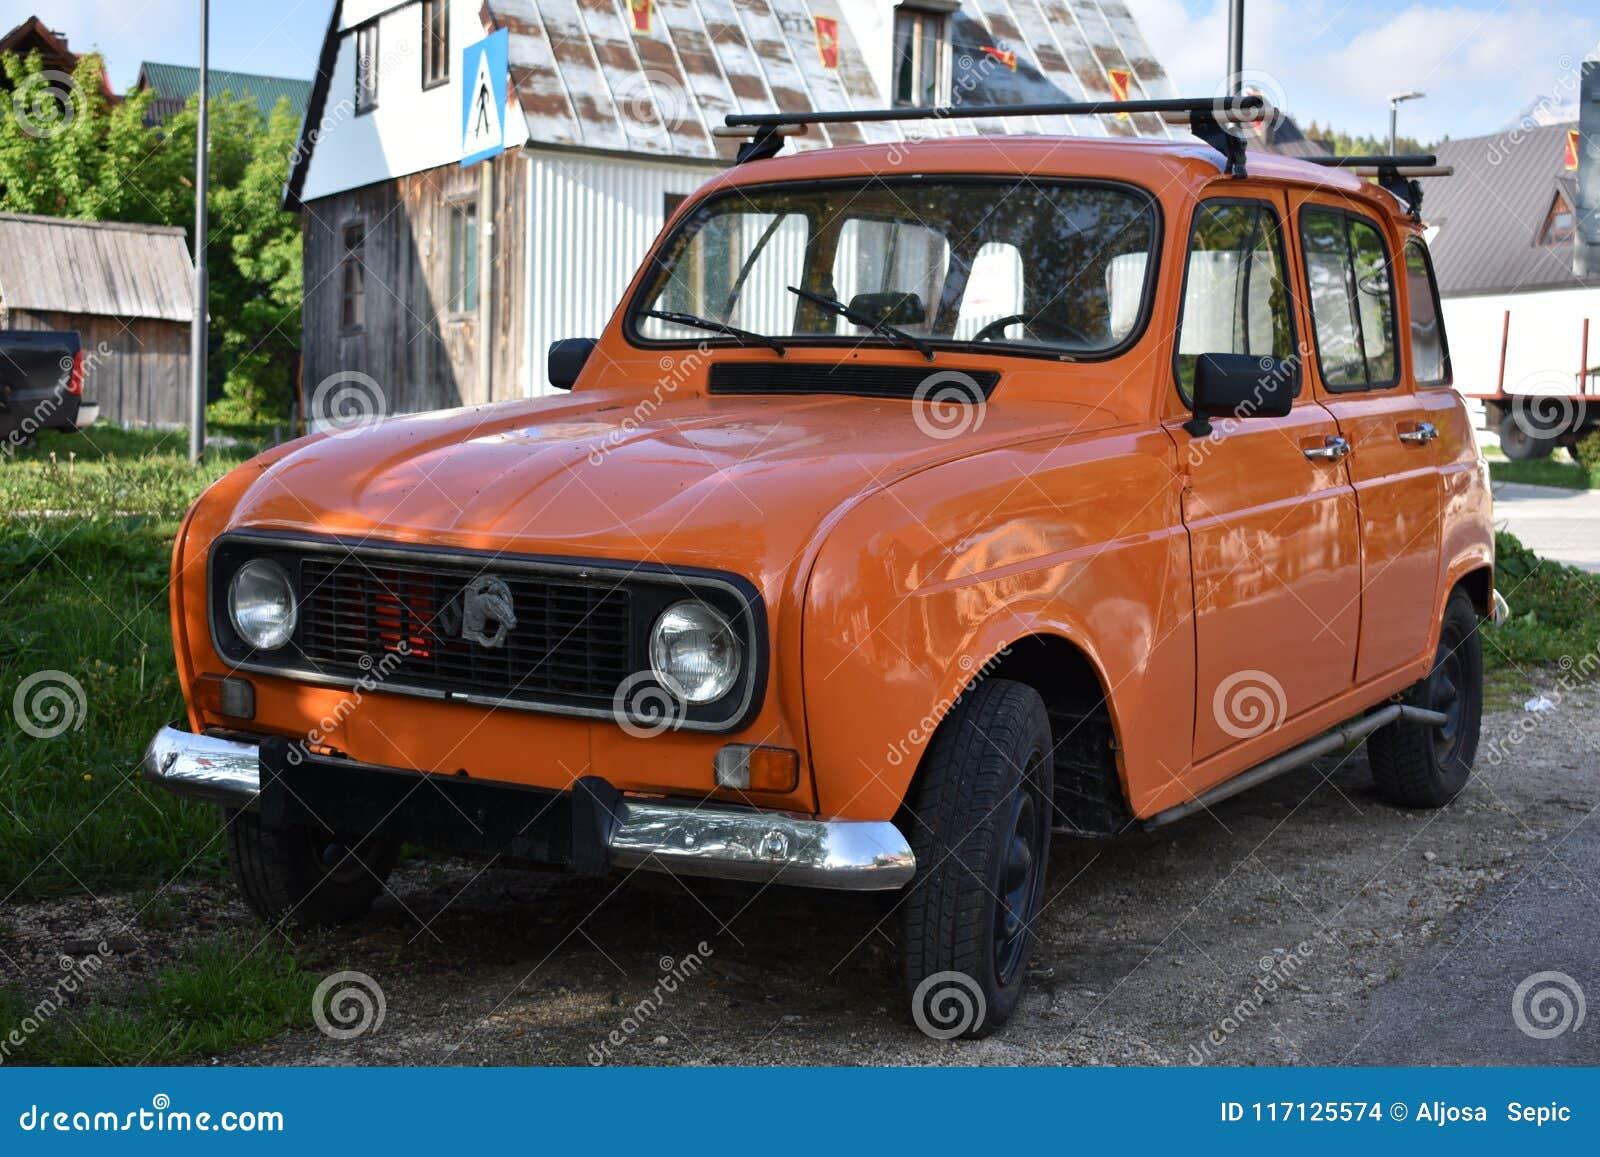 The orange old model of Renault four